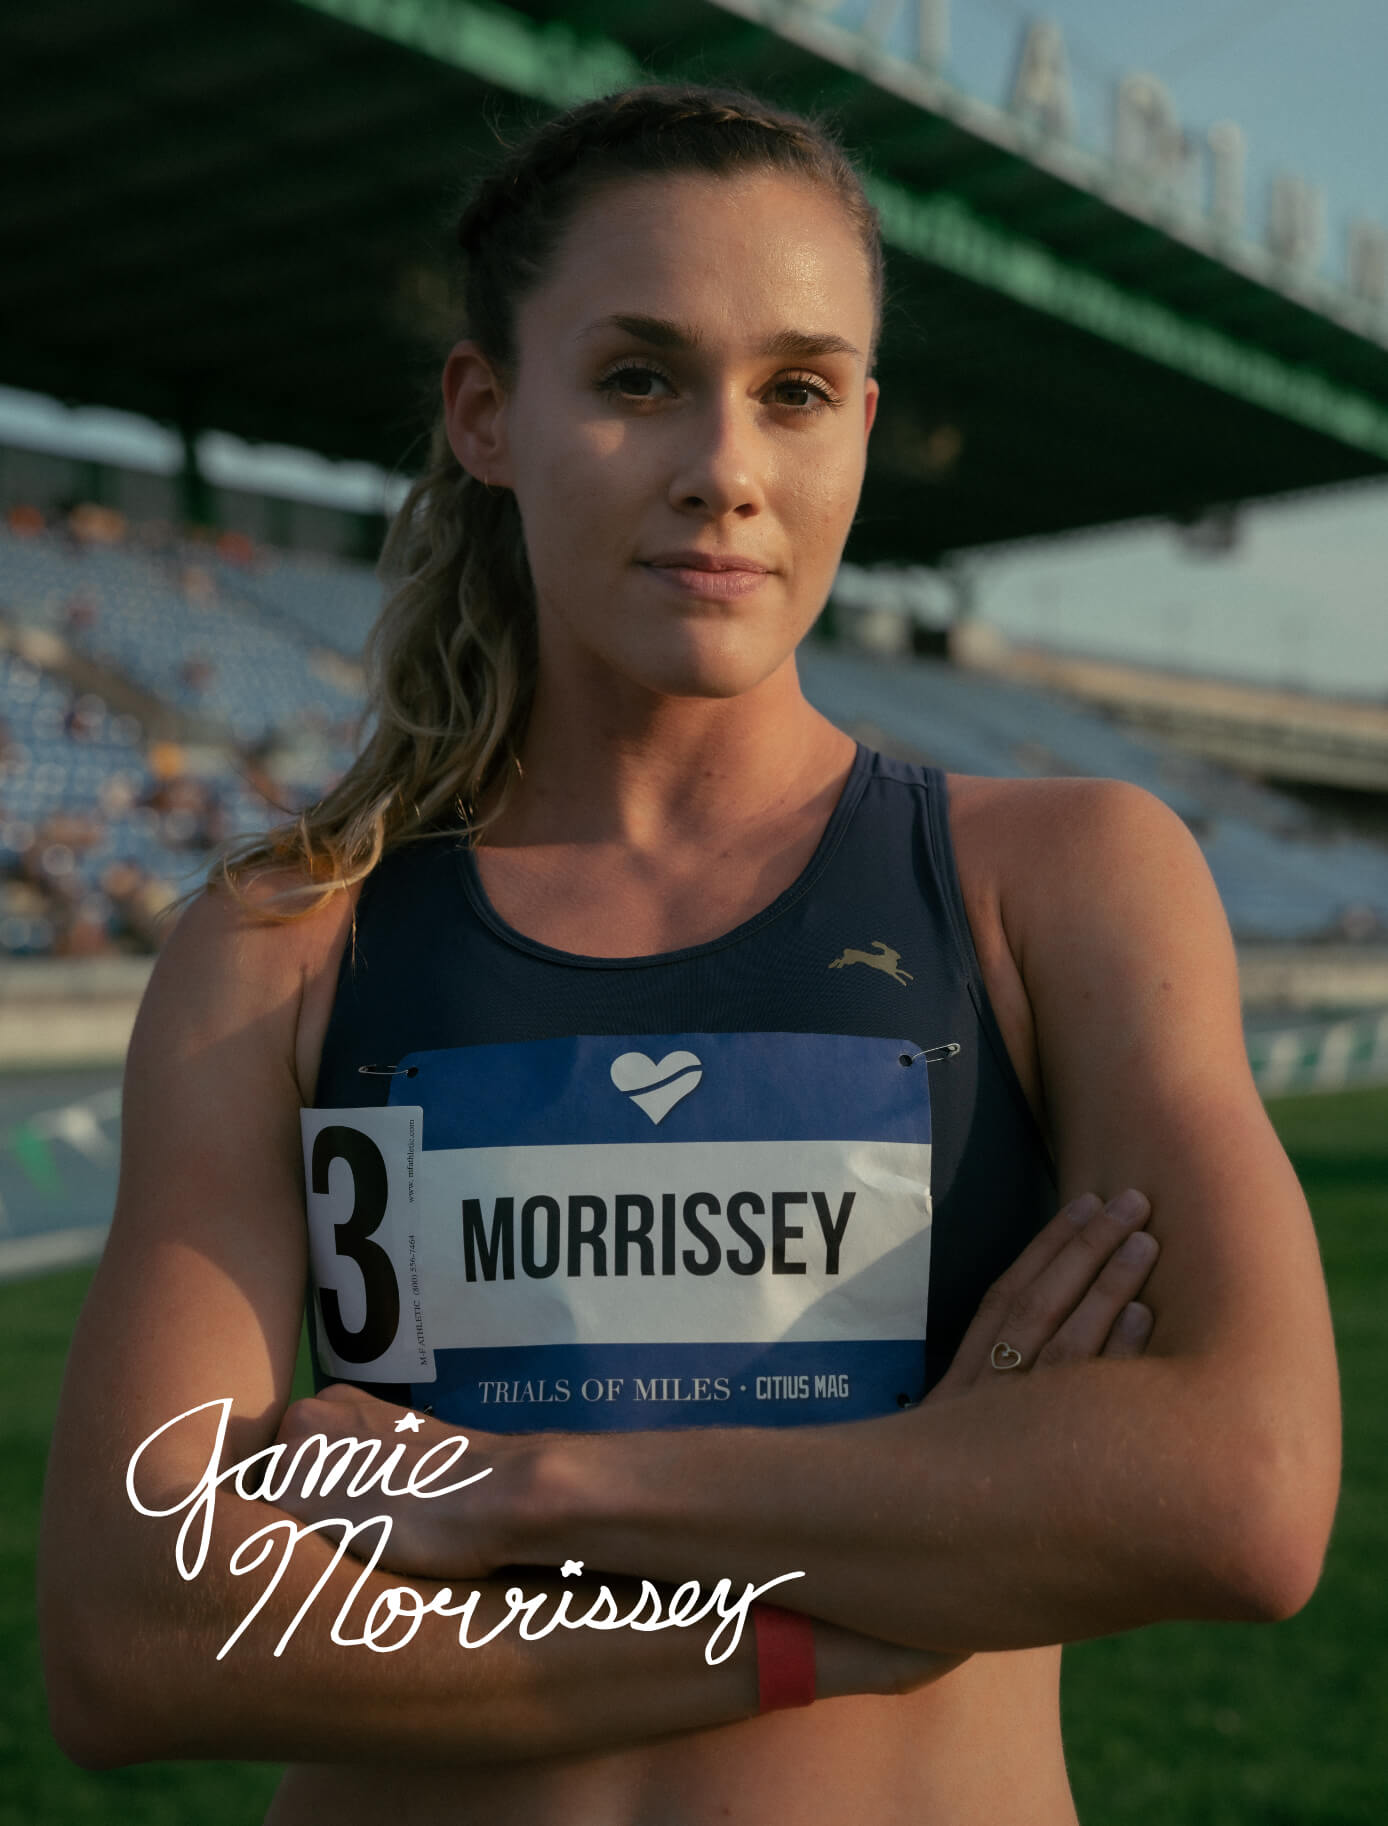 Jamie Morrisey